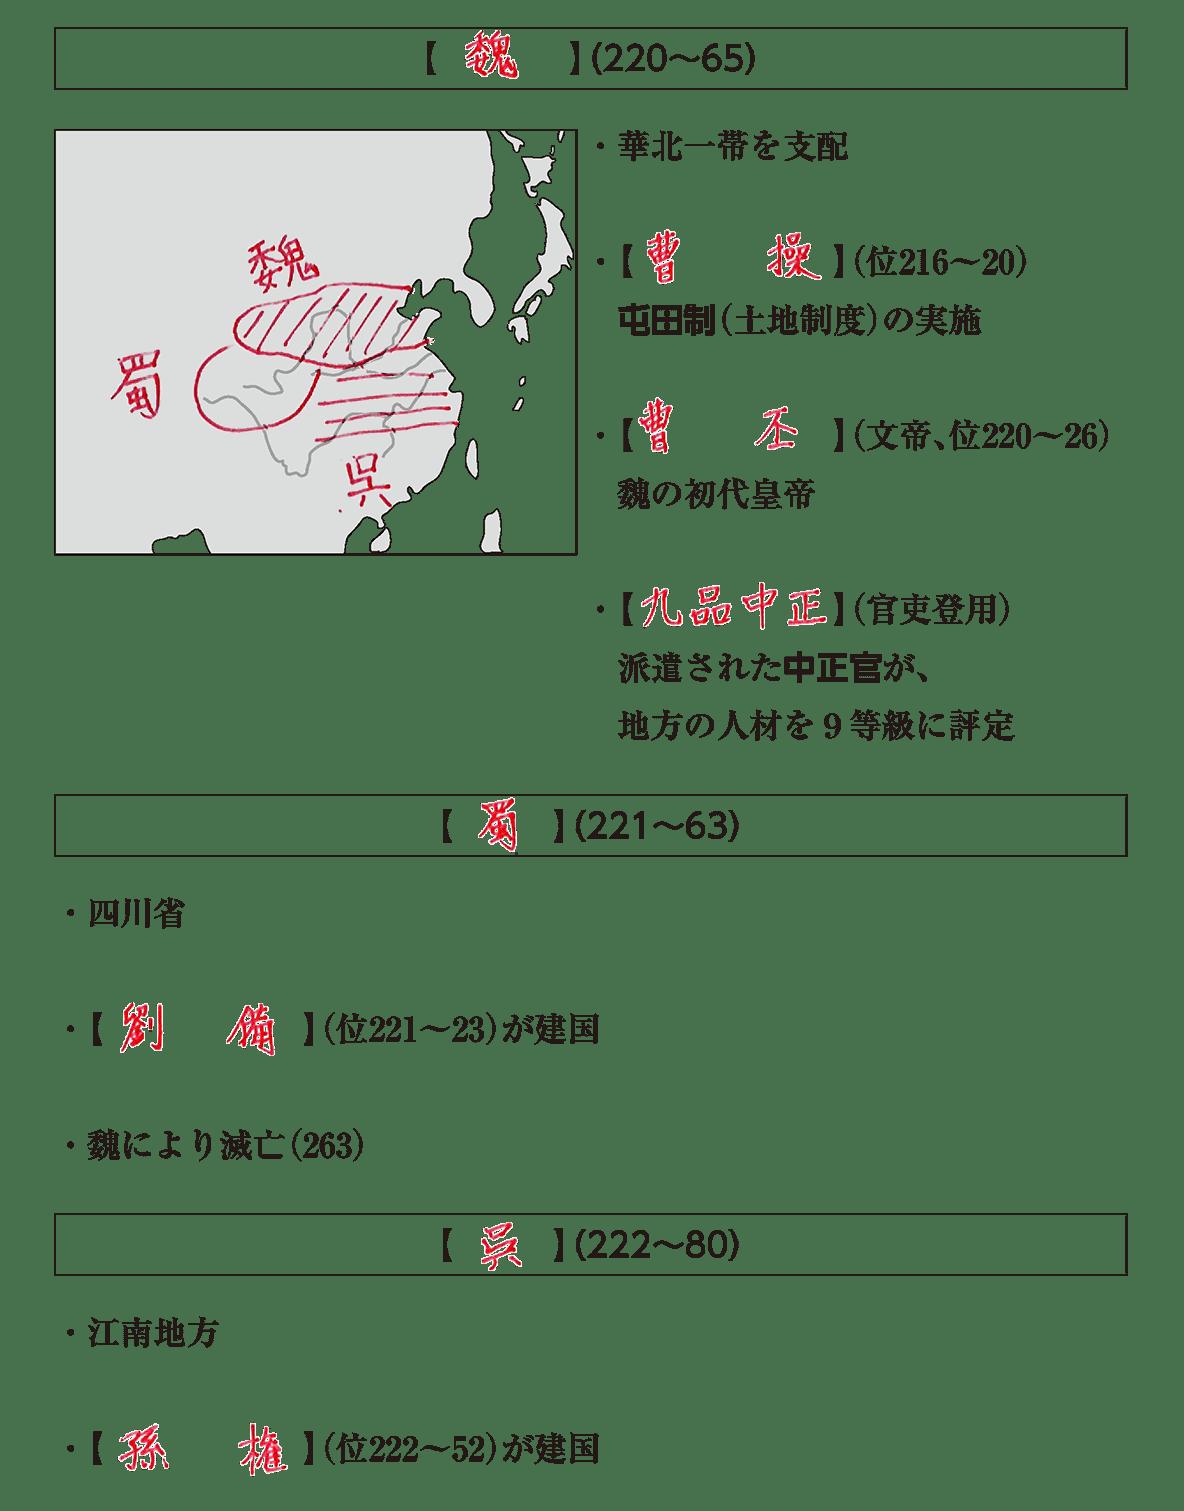 高校世界史 中国の分裂・混乱期1 答え全部